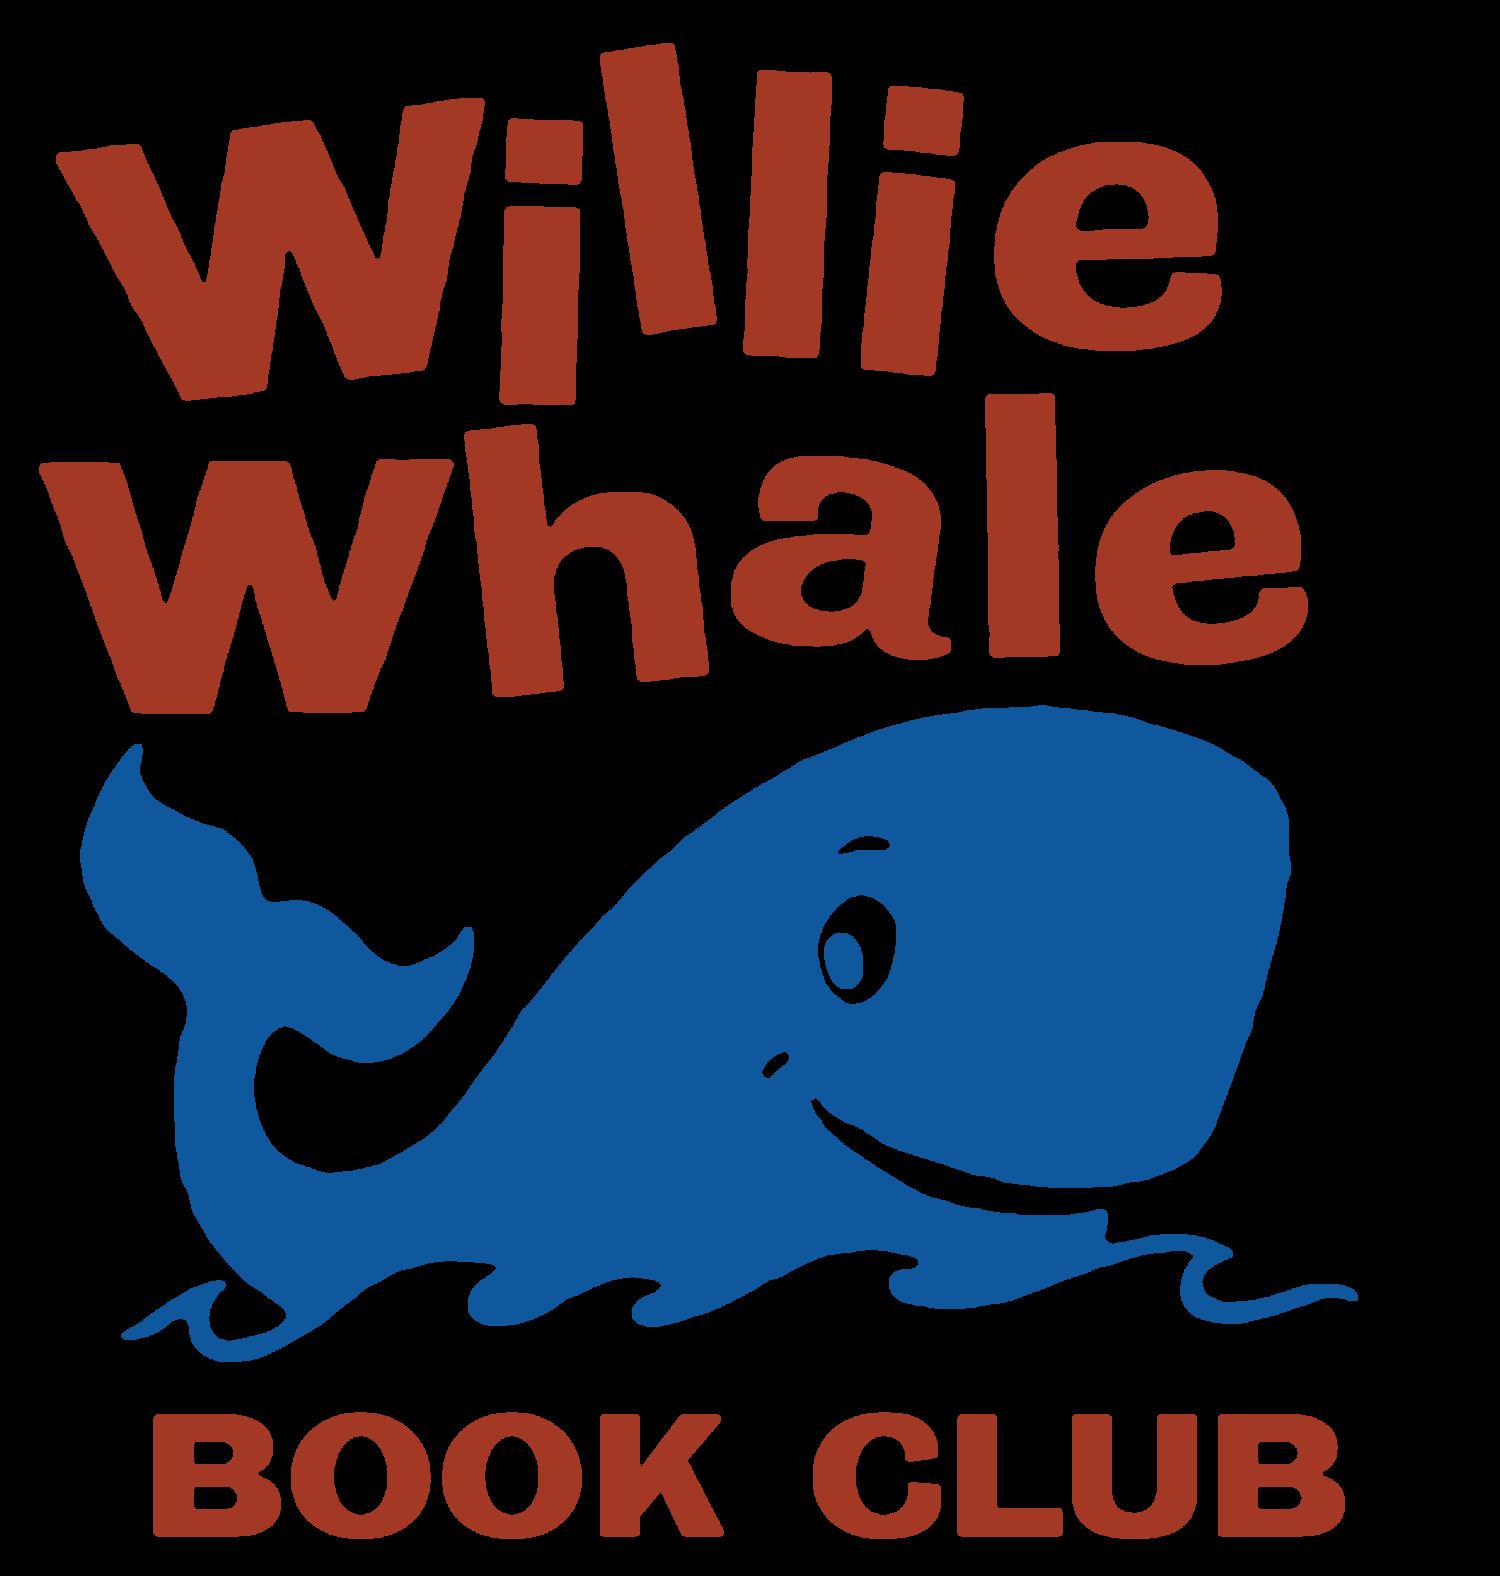 Willie Whale